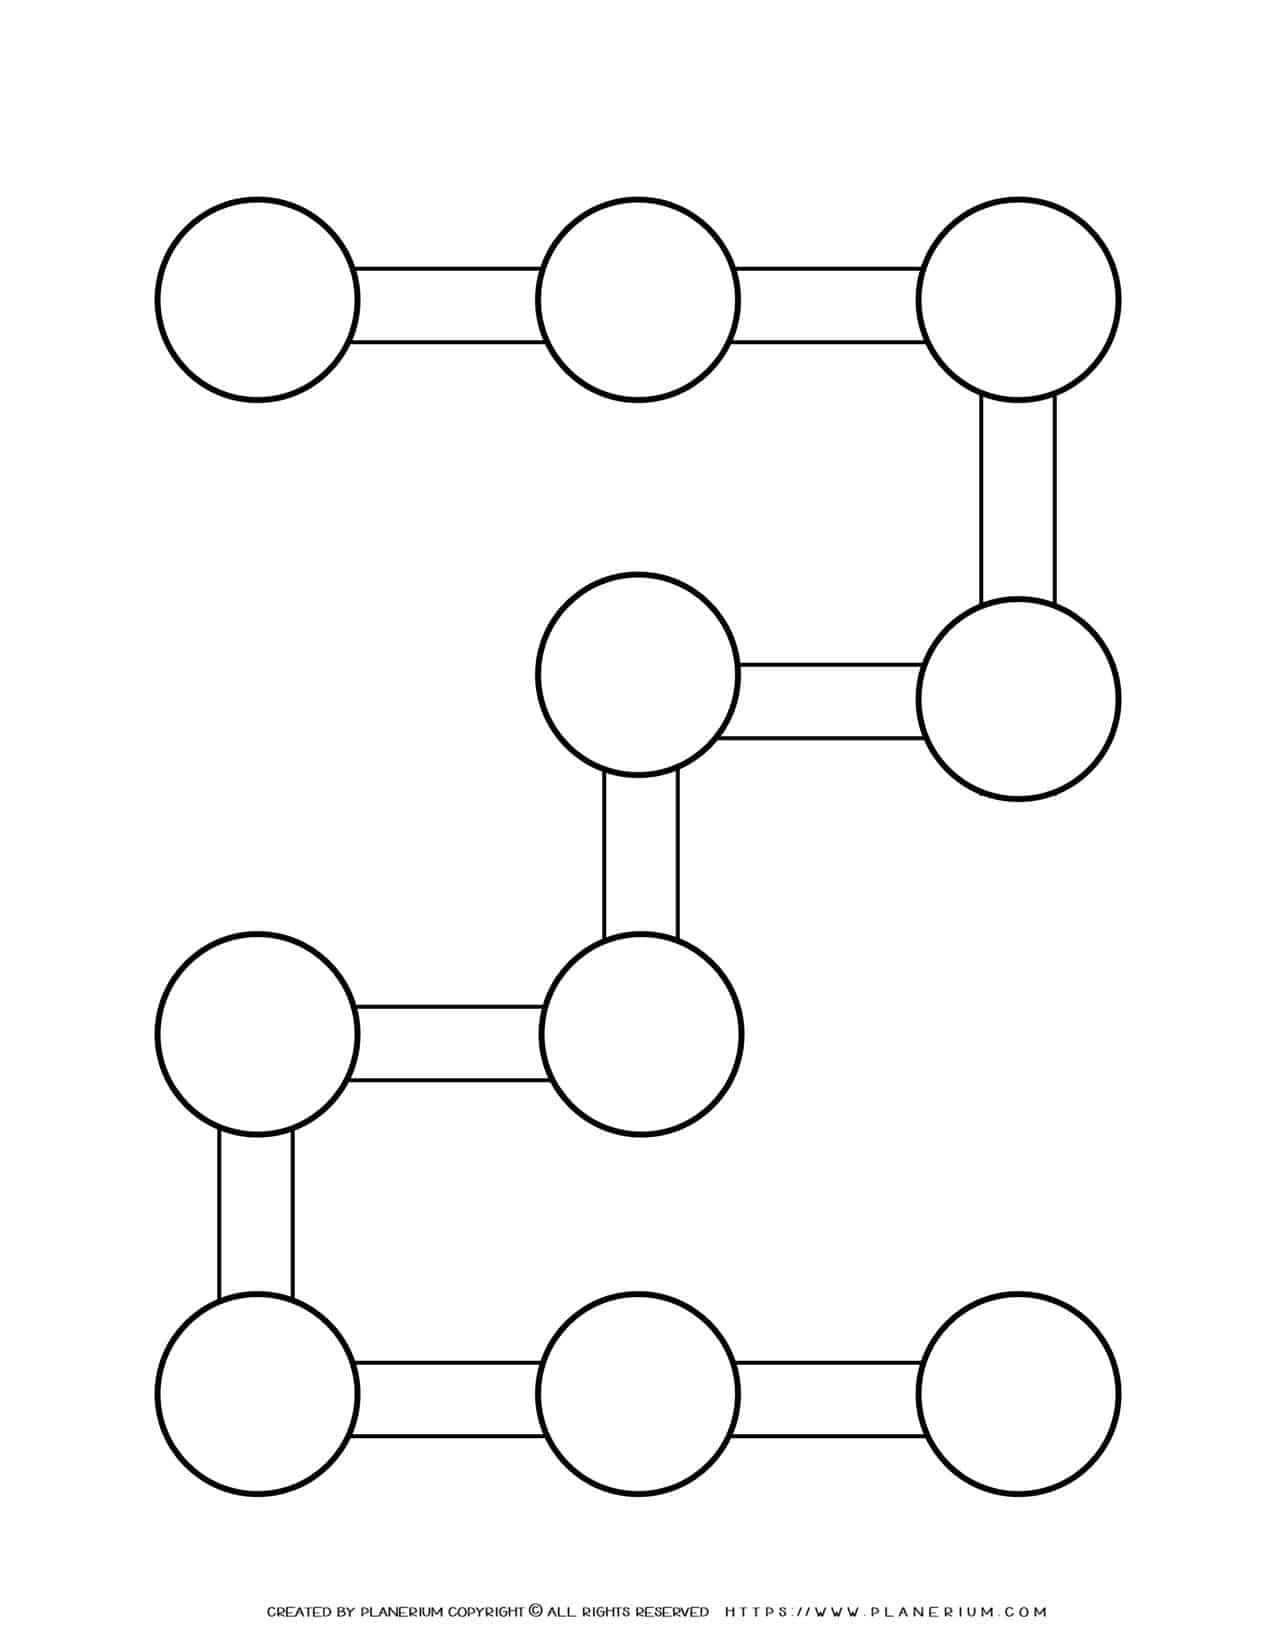 Sequence Chart Template - Ten Circles on 2 Shape | Planerium